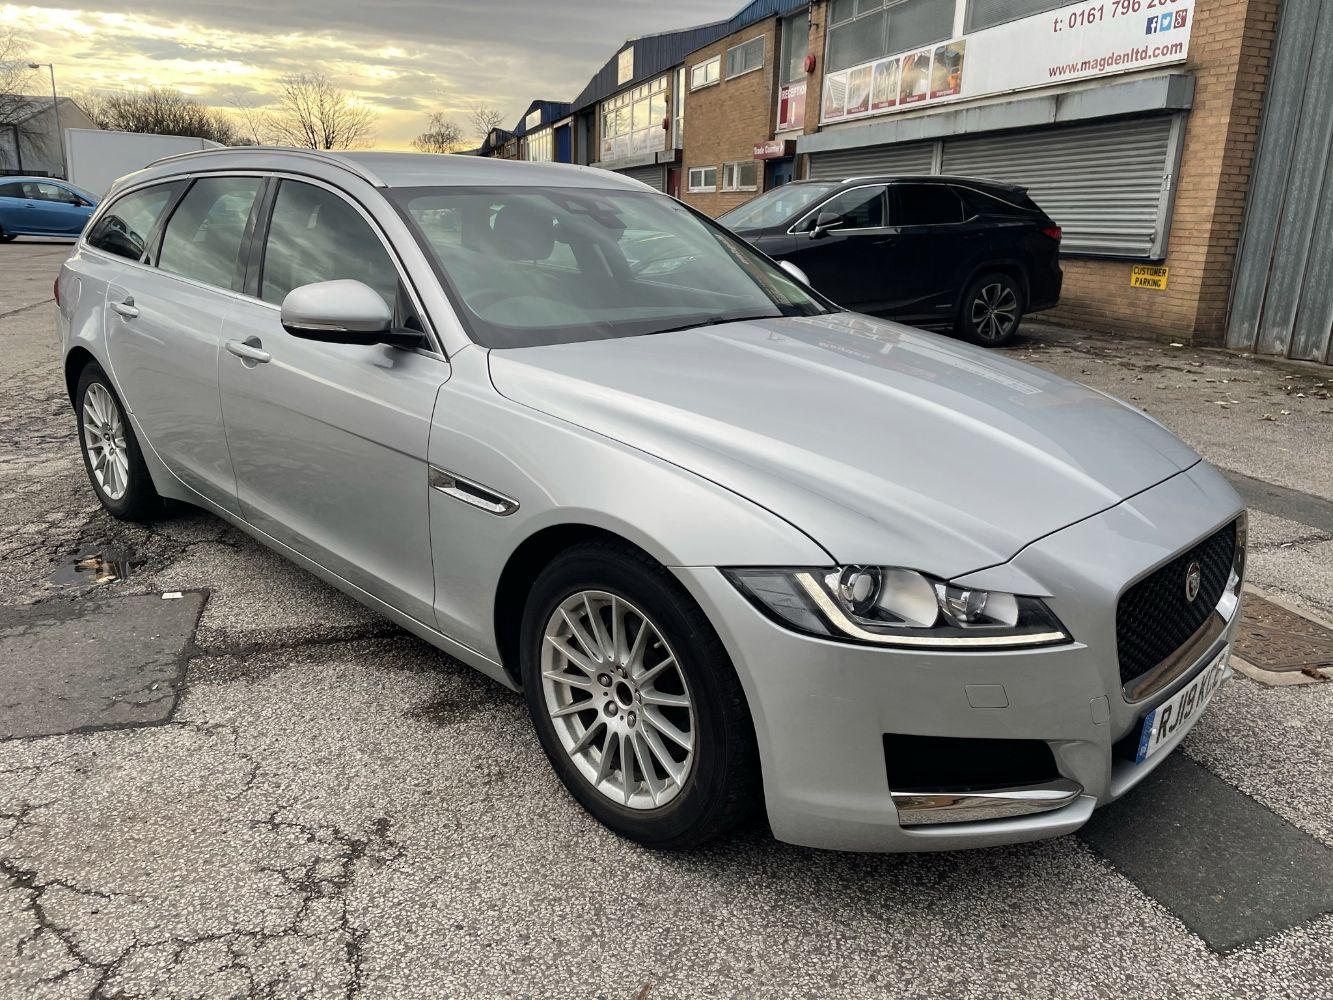 Motor Vehicle Sale | 3 x Jaguar XF Prestige D Auto Estates | 19 Plates | Ford Ranger Wildtrak DCI 4x4 Pick-Up | 67 Plate | 10% Buyers Premium